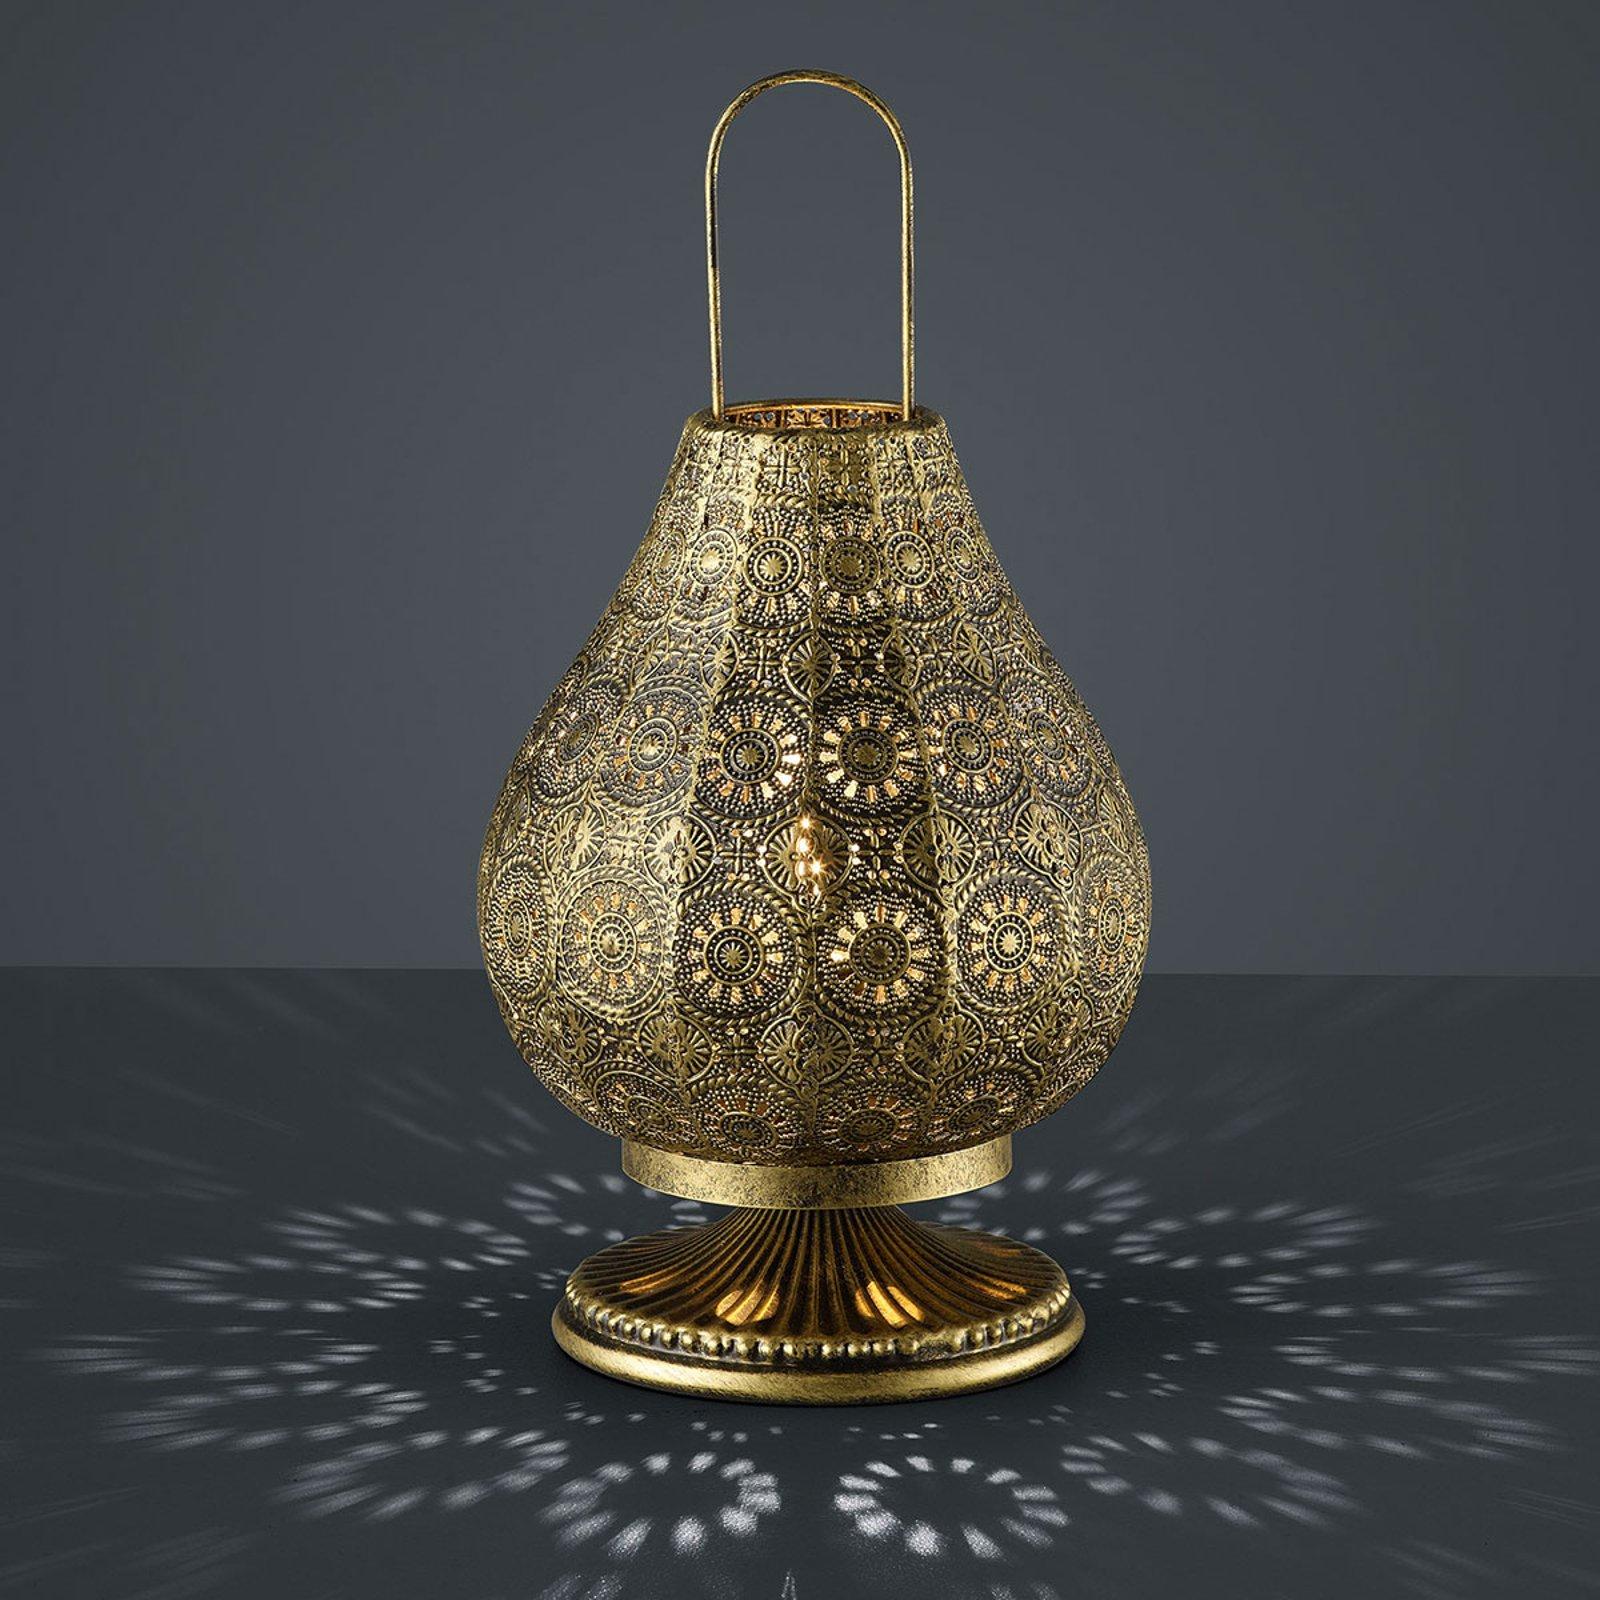 Jasmin - bordlampe i orient-design, antikk messing